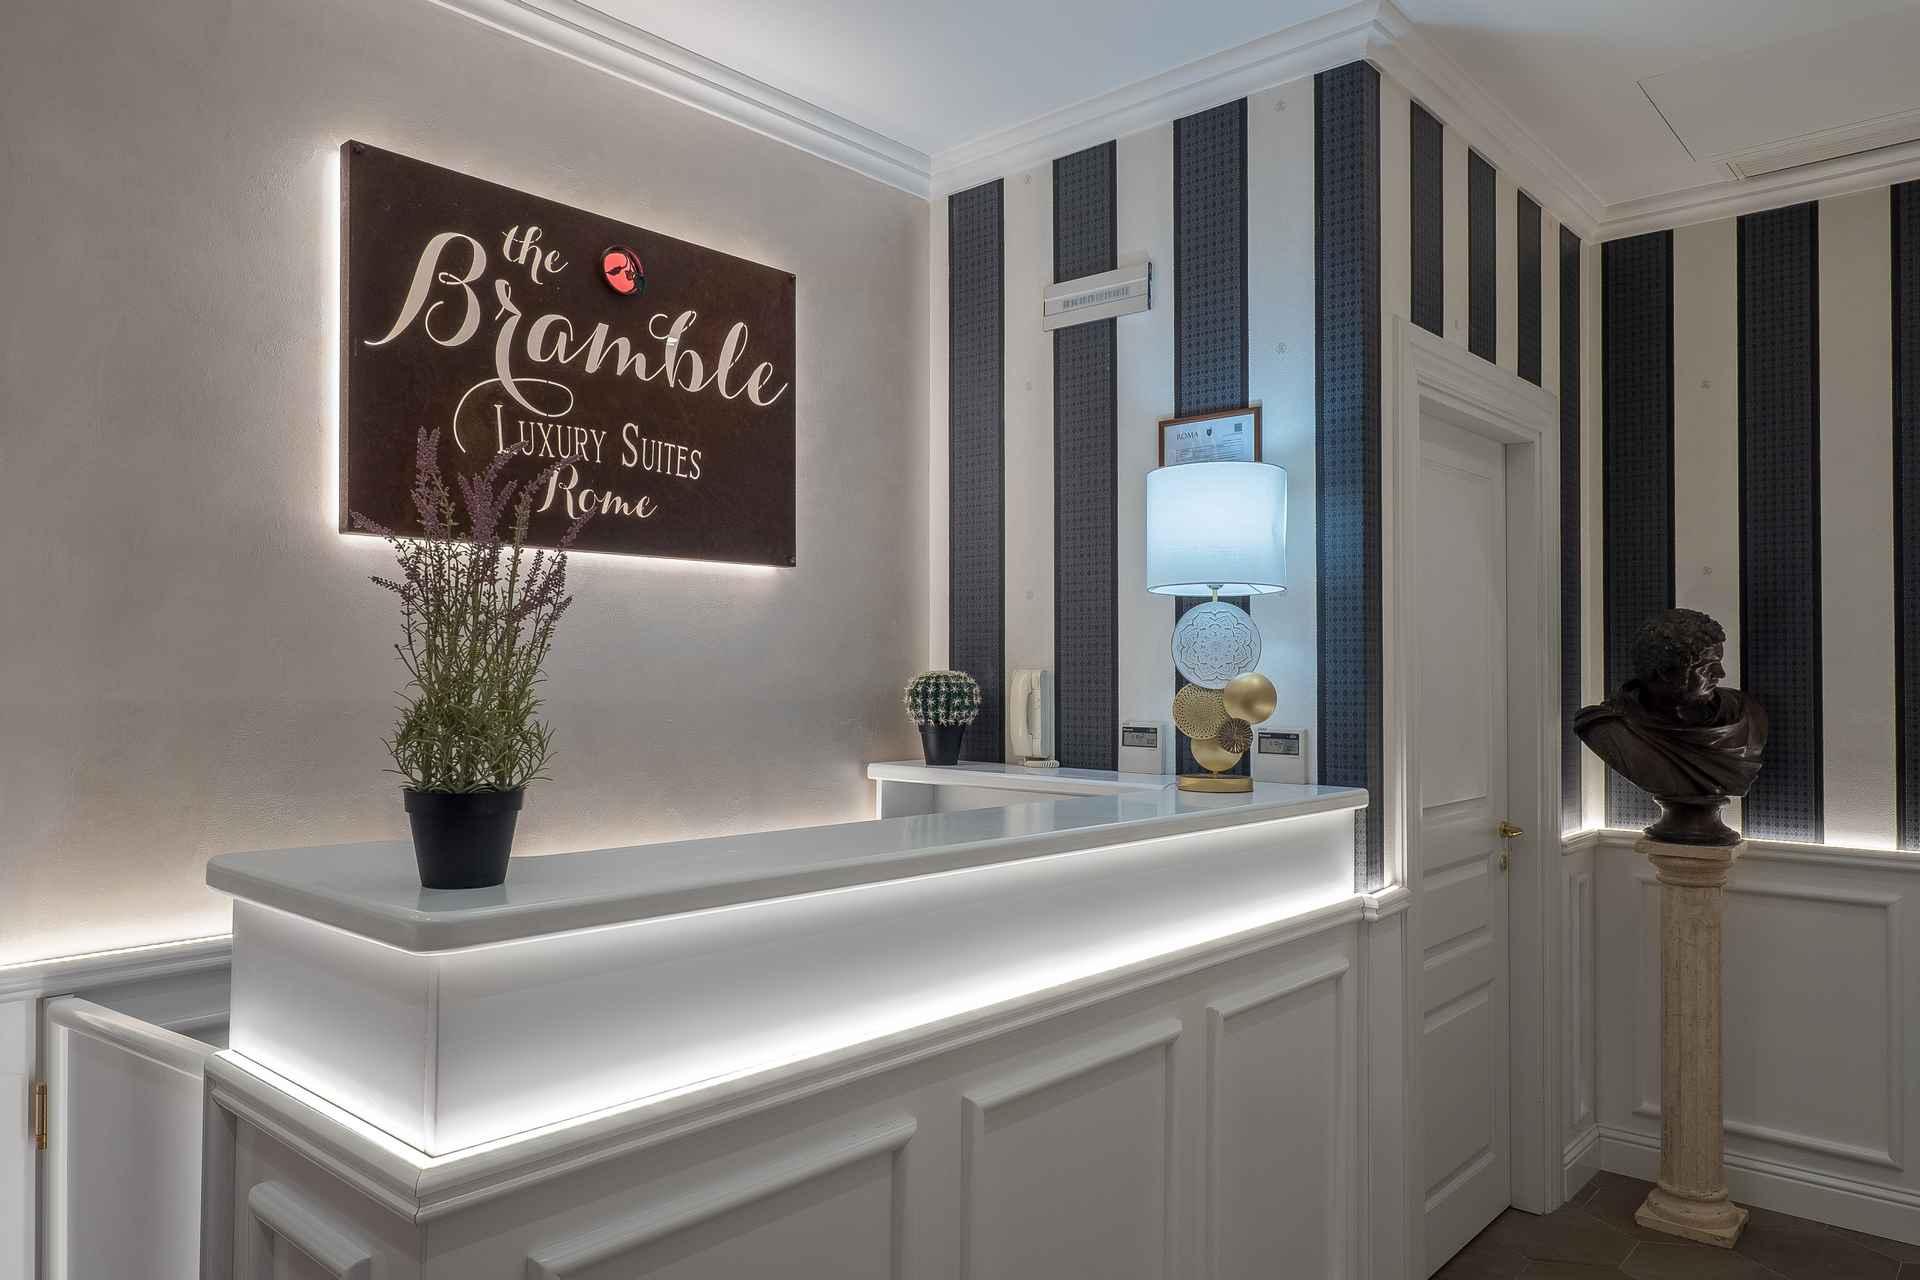 Bramble Luxury Suites - Reception